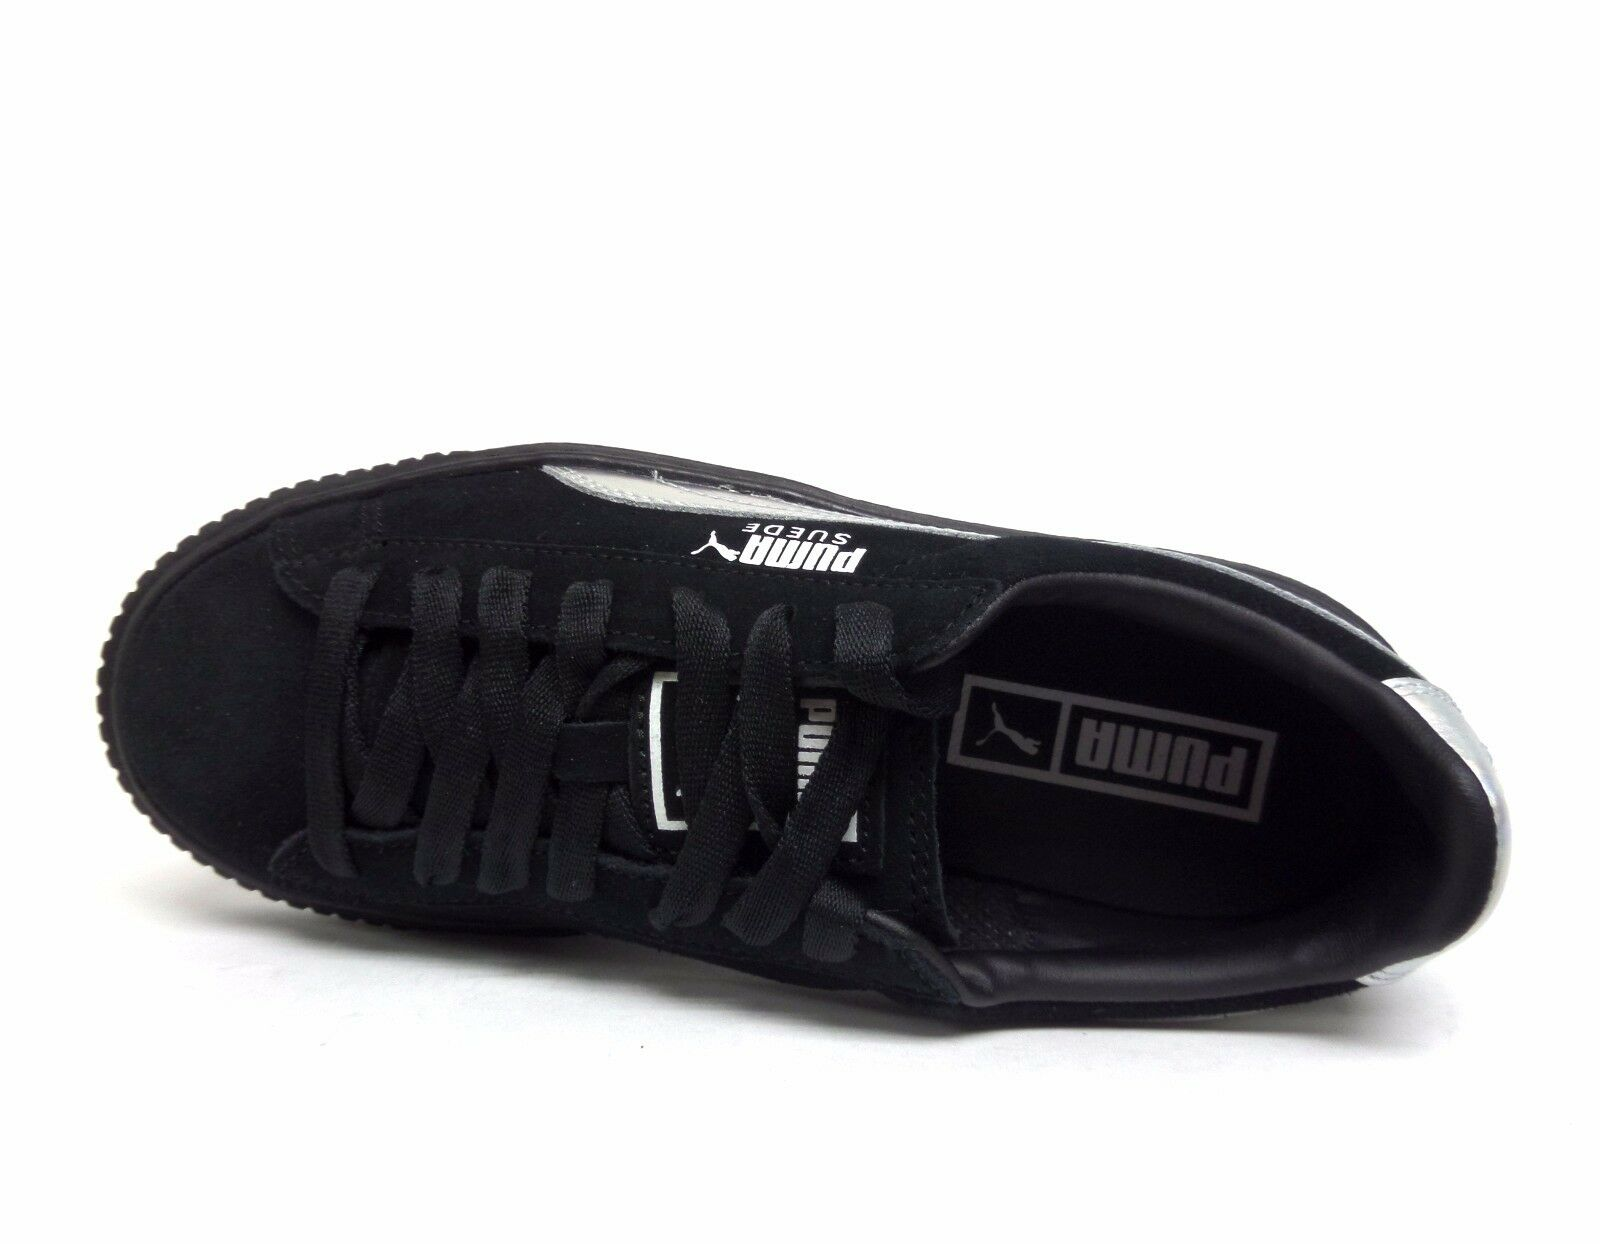 brand new 90bb5 fc502 ... PUMA Women s SUEDE SUEDE SUEDE PLATFORM EXPLOSIVE Shoes Puma  Black Black 363649-01 b ...